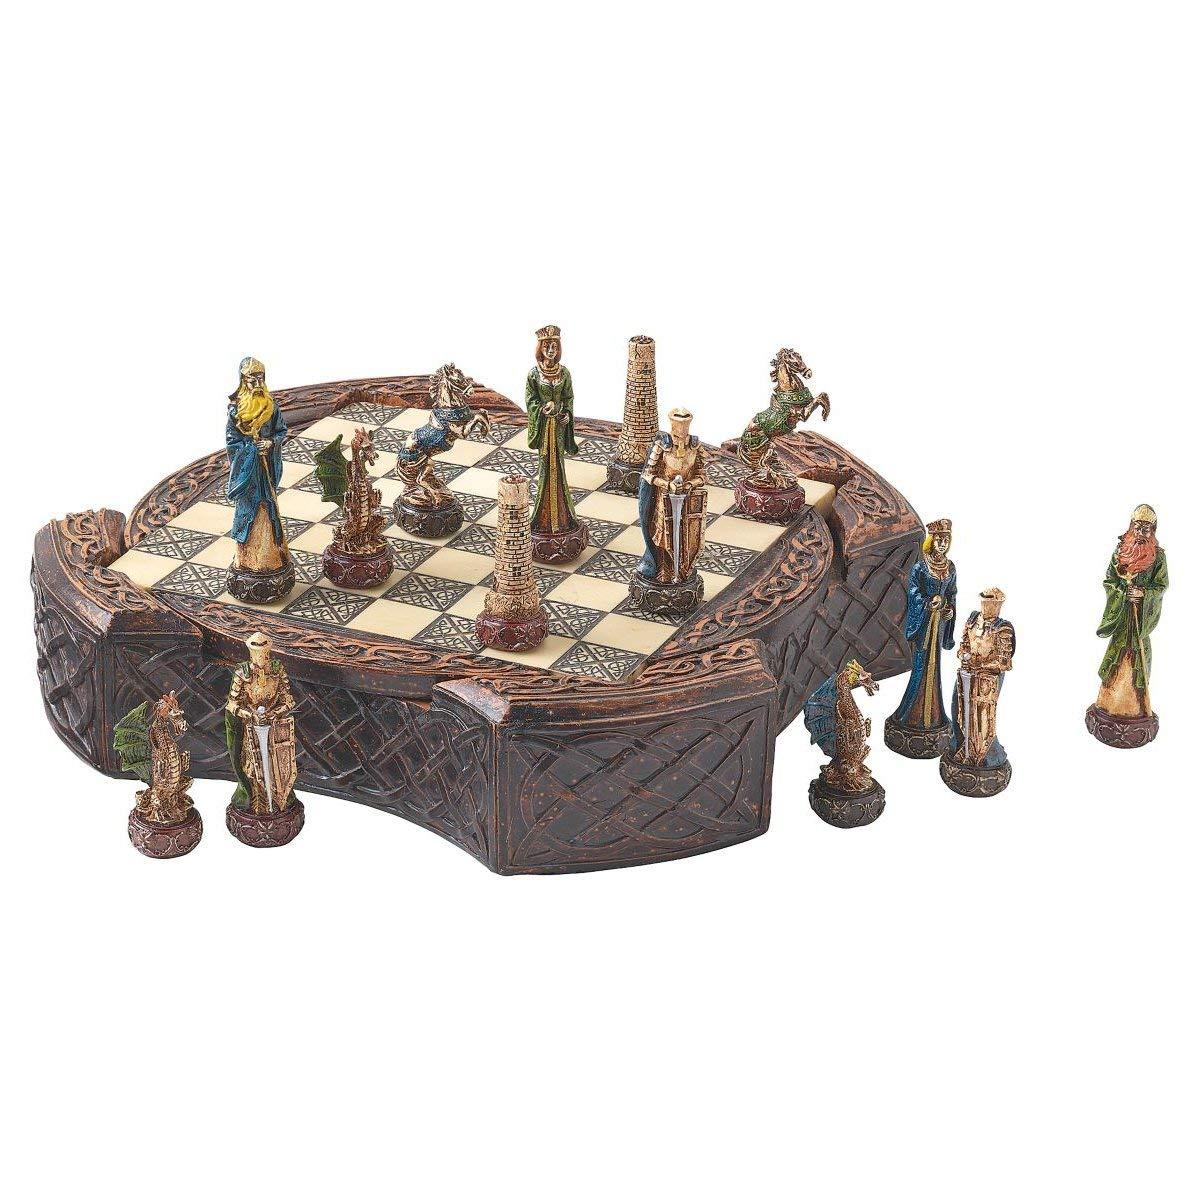 Design Toscano Legendary Celtic Warriors Chess Set and Board